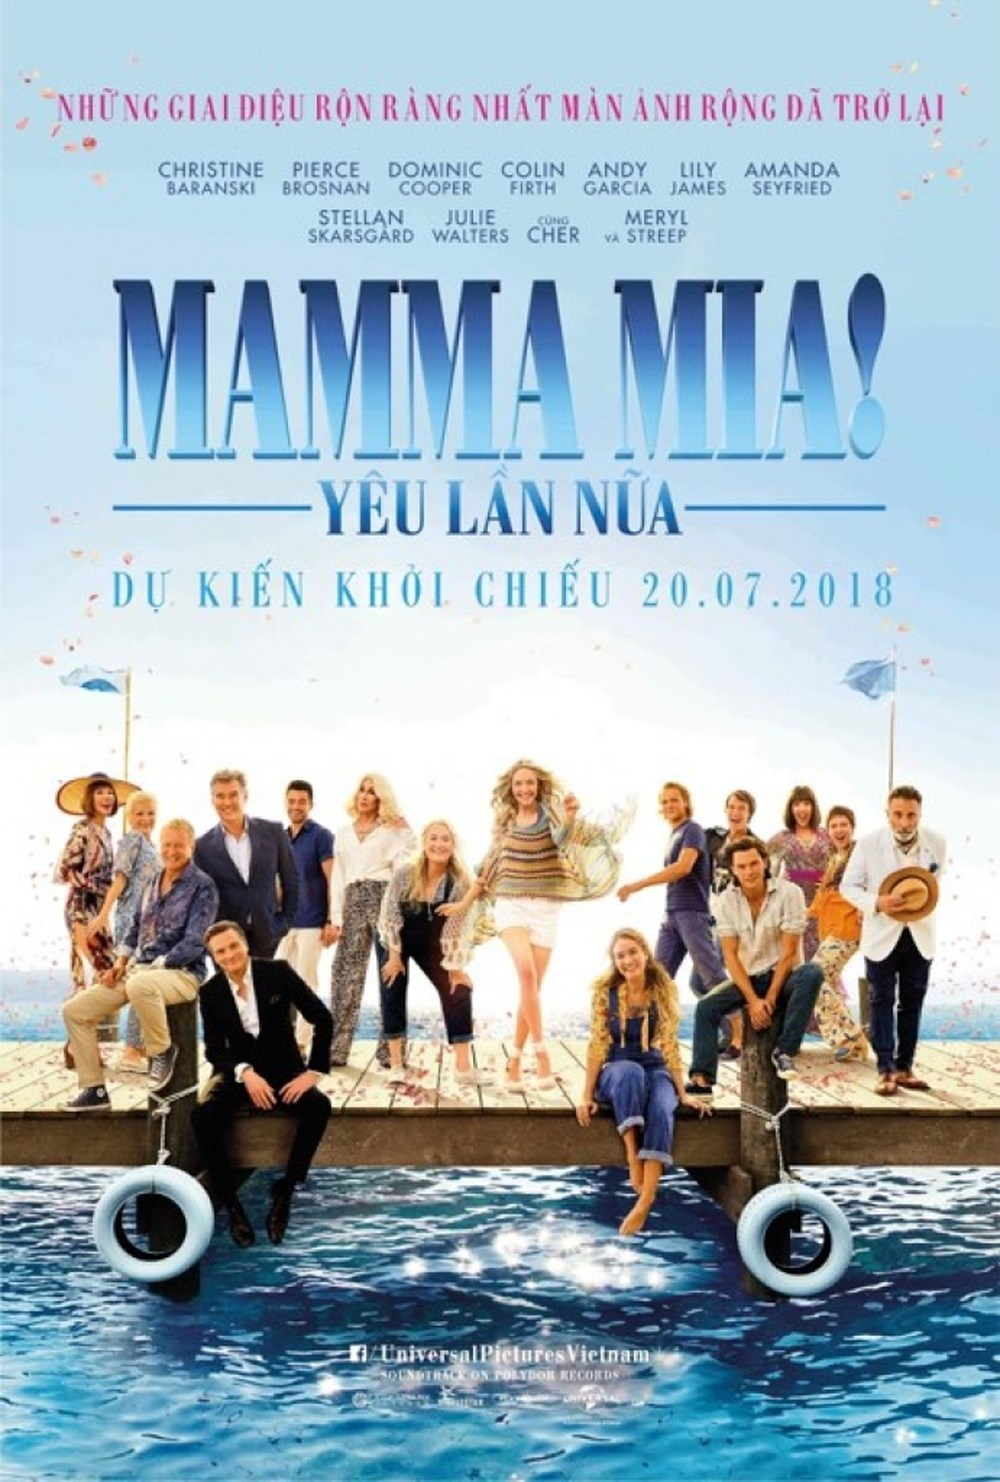 'Mamma Mia! 2': Hay yeu nhu chua tung yeu hinh anh 1